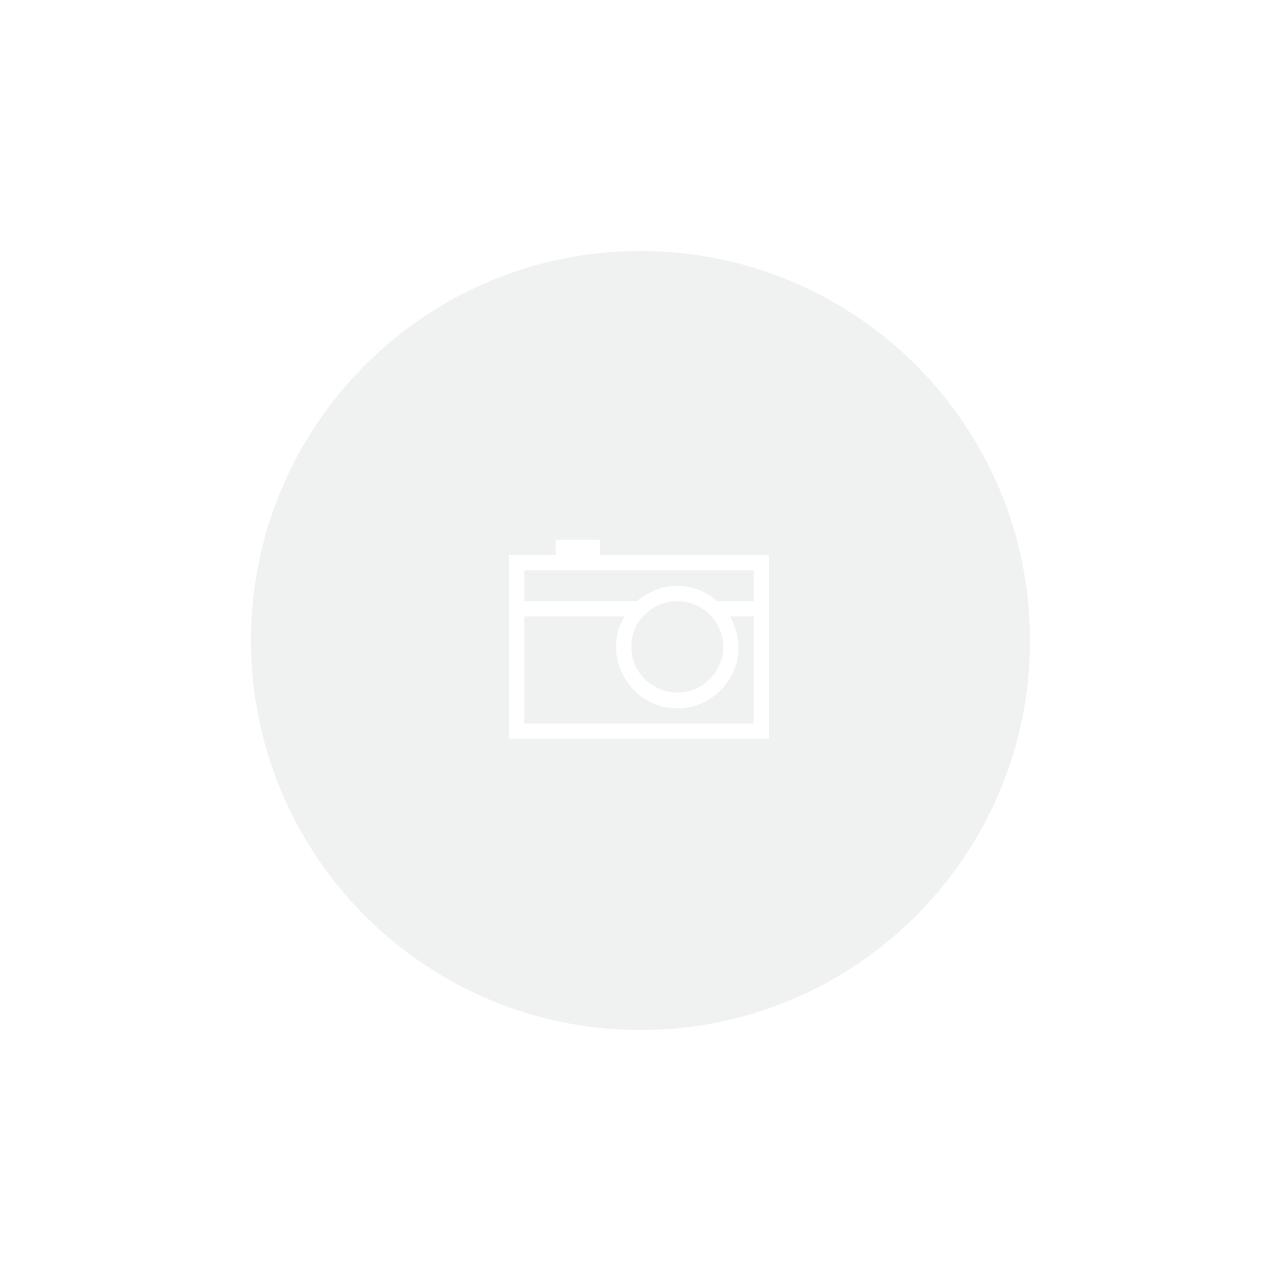 Fonte Corsair 850W 80 Plus Gold Modular Serie White RMX850 - CP-9020156-WW